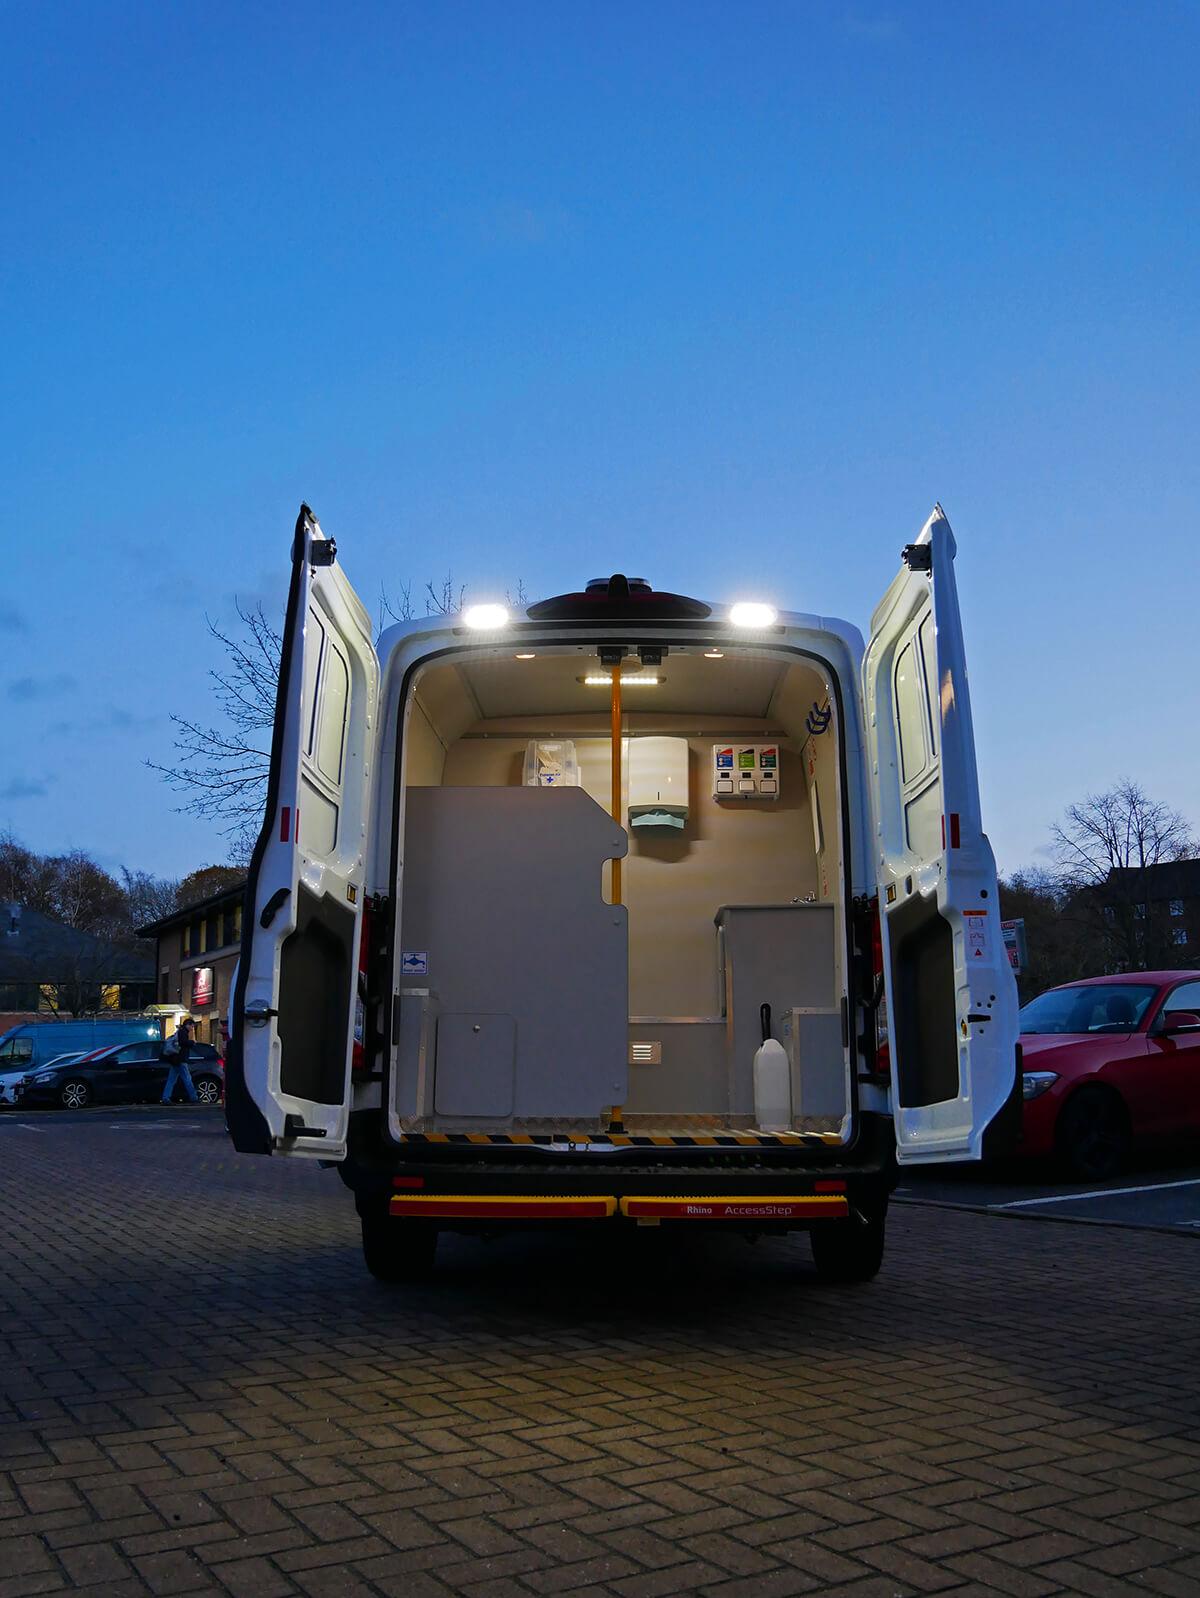 SM UK Welfare unit van rear view